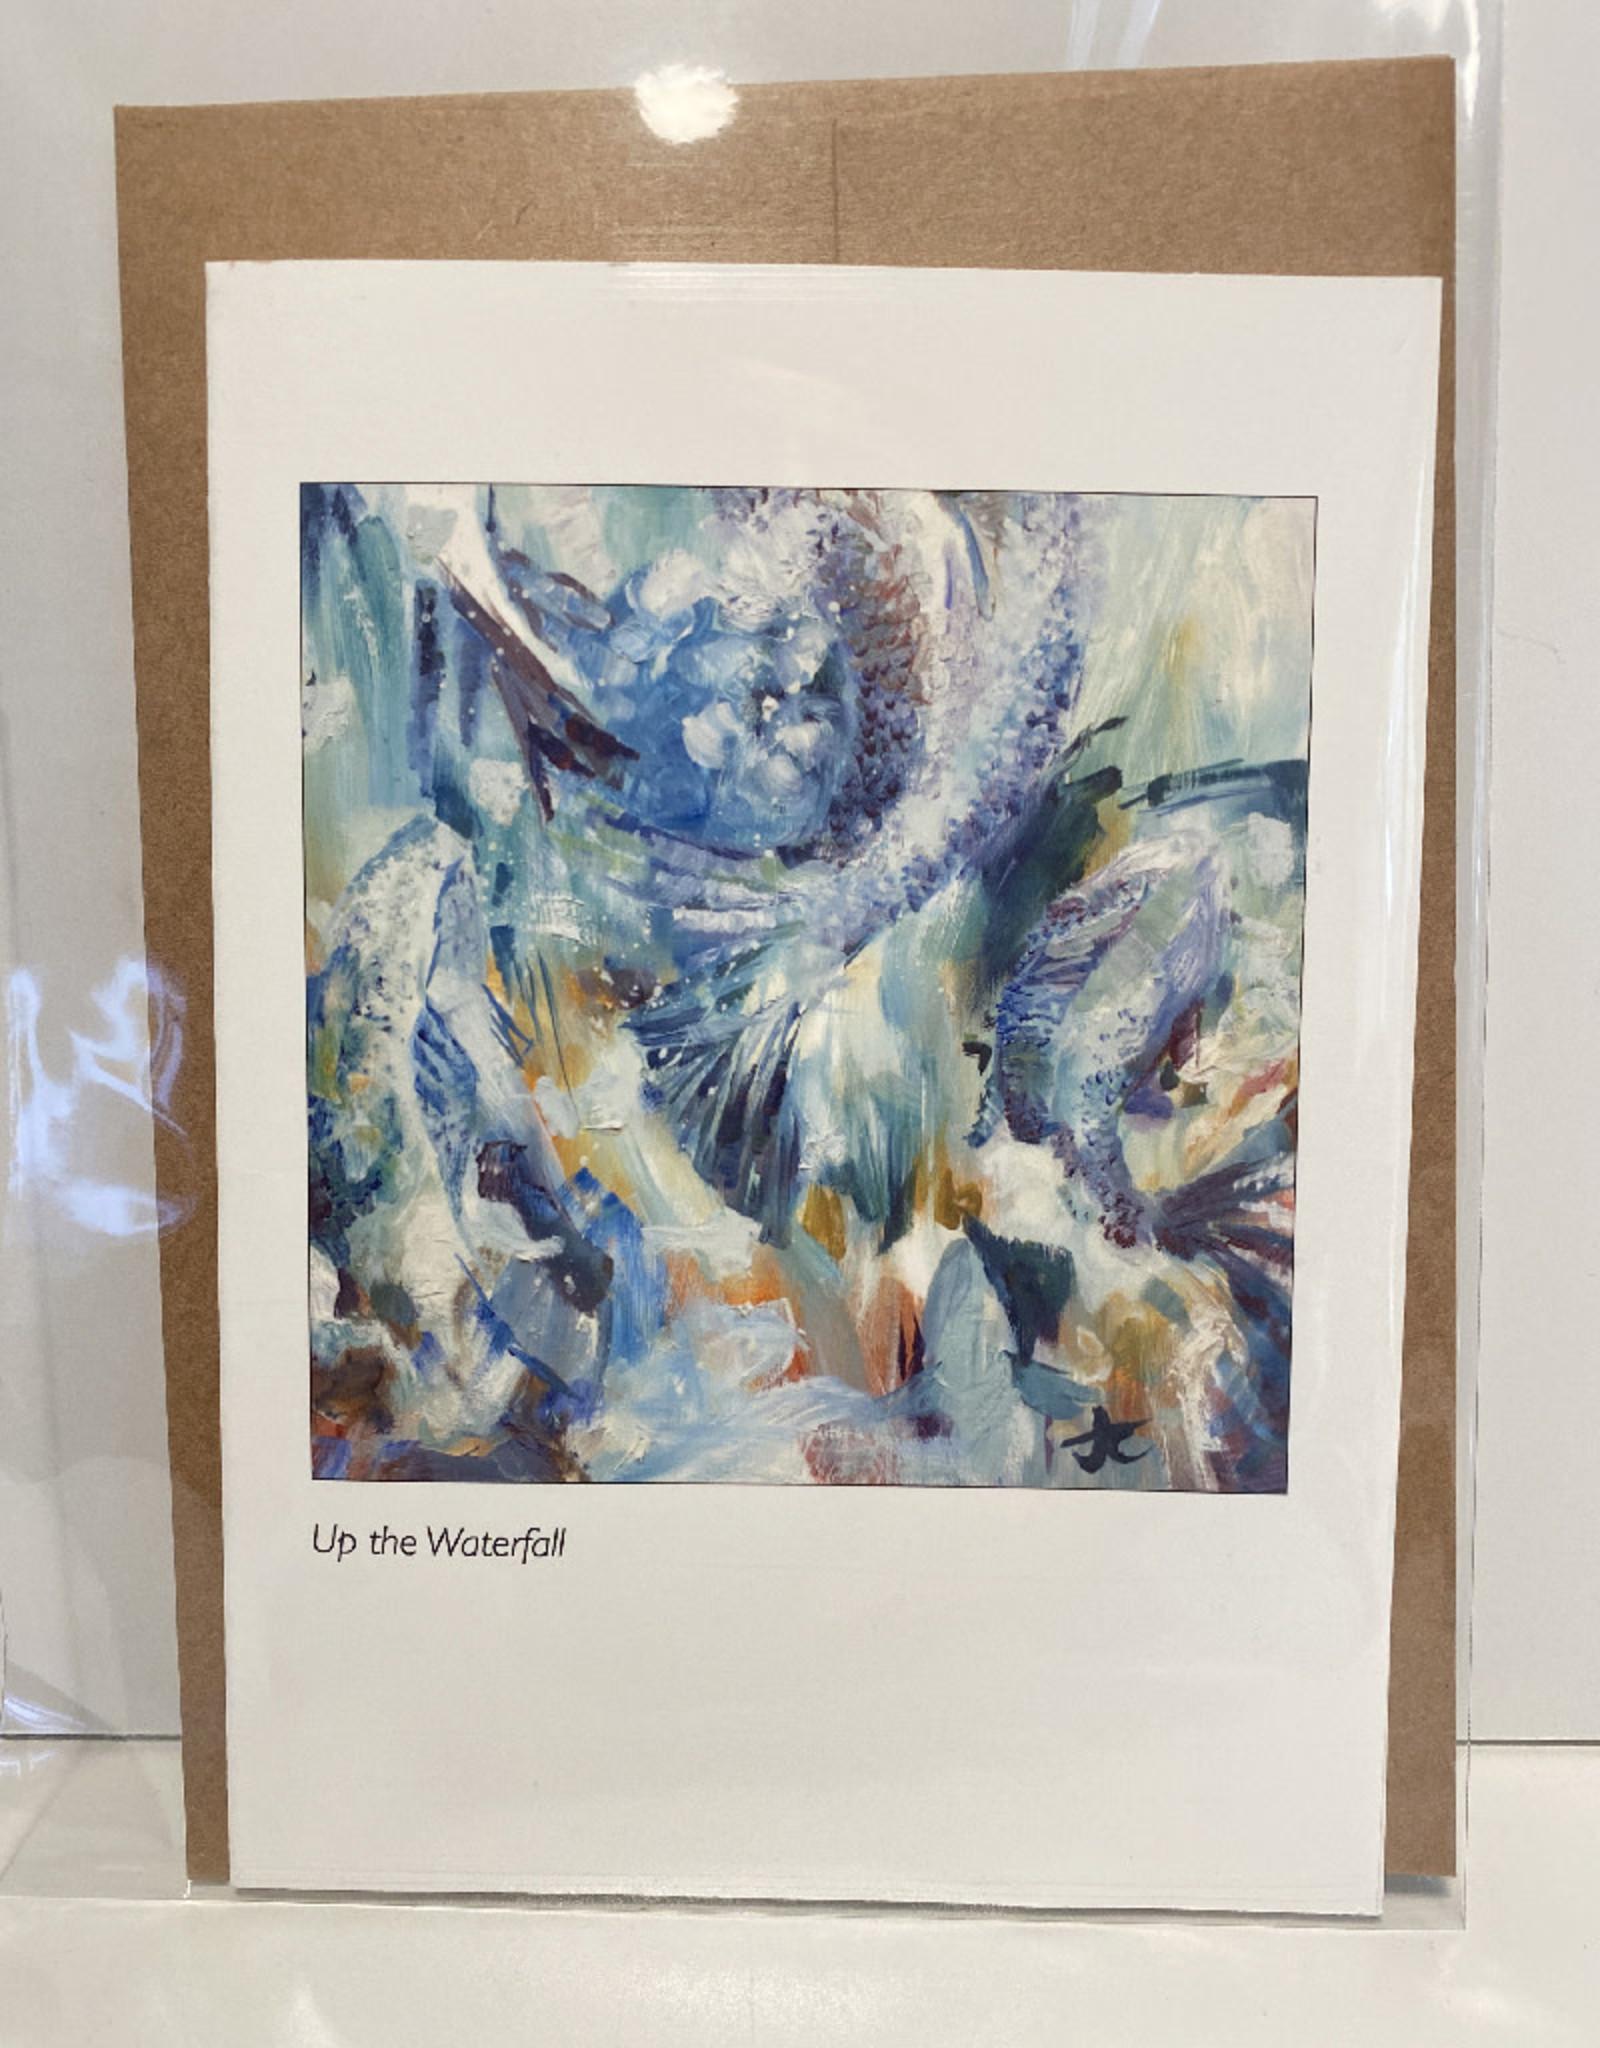 Jennifer Cook-Chrysos Chrysos Designs Artworks, Greeting Card, Up the Waterfall, 5 x 7